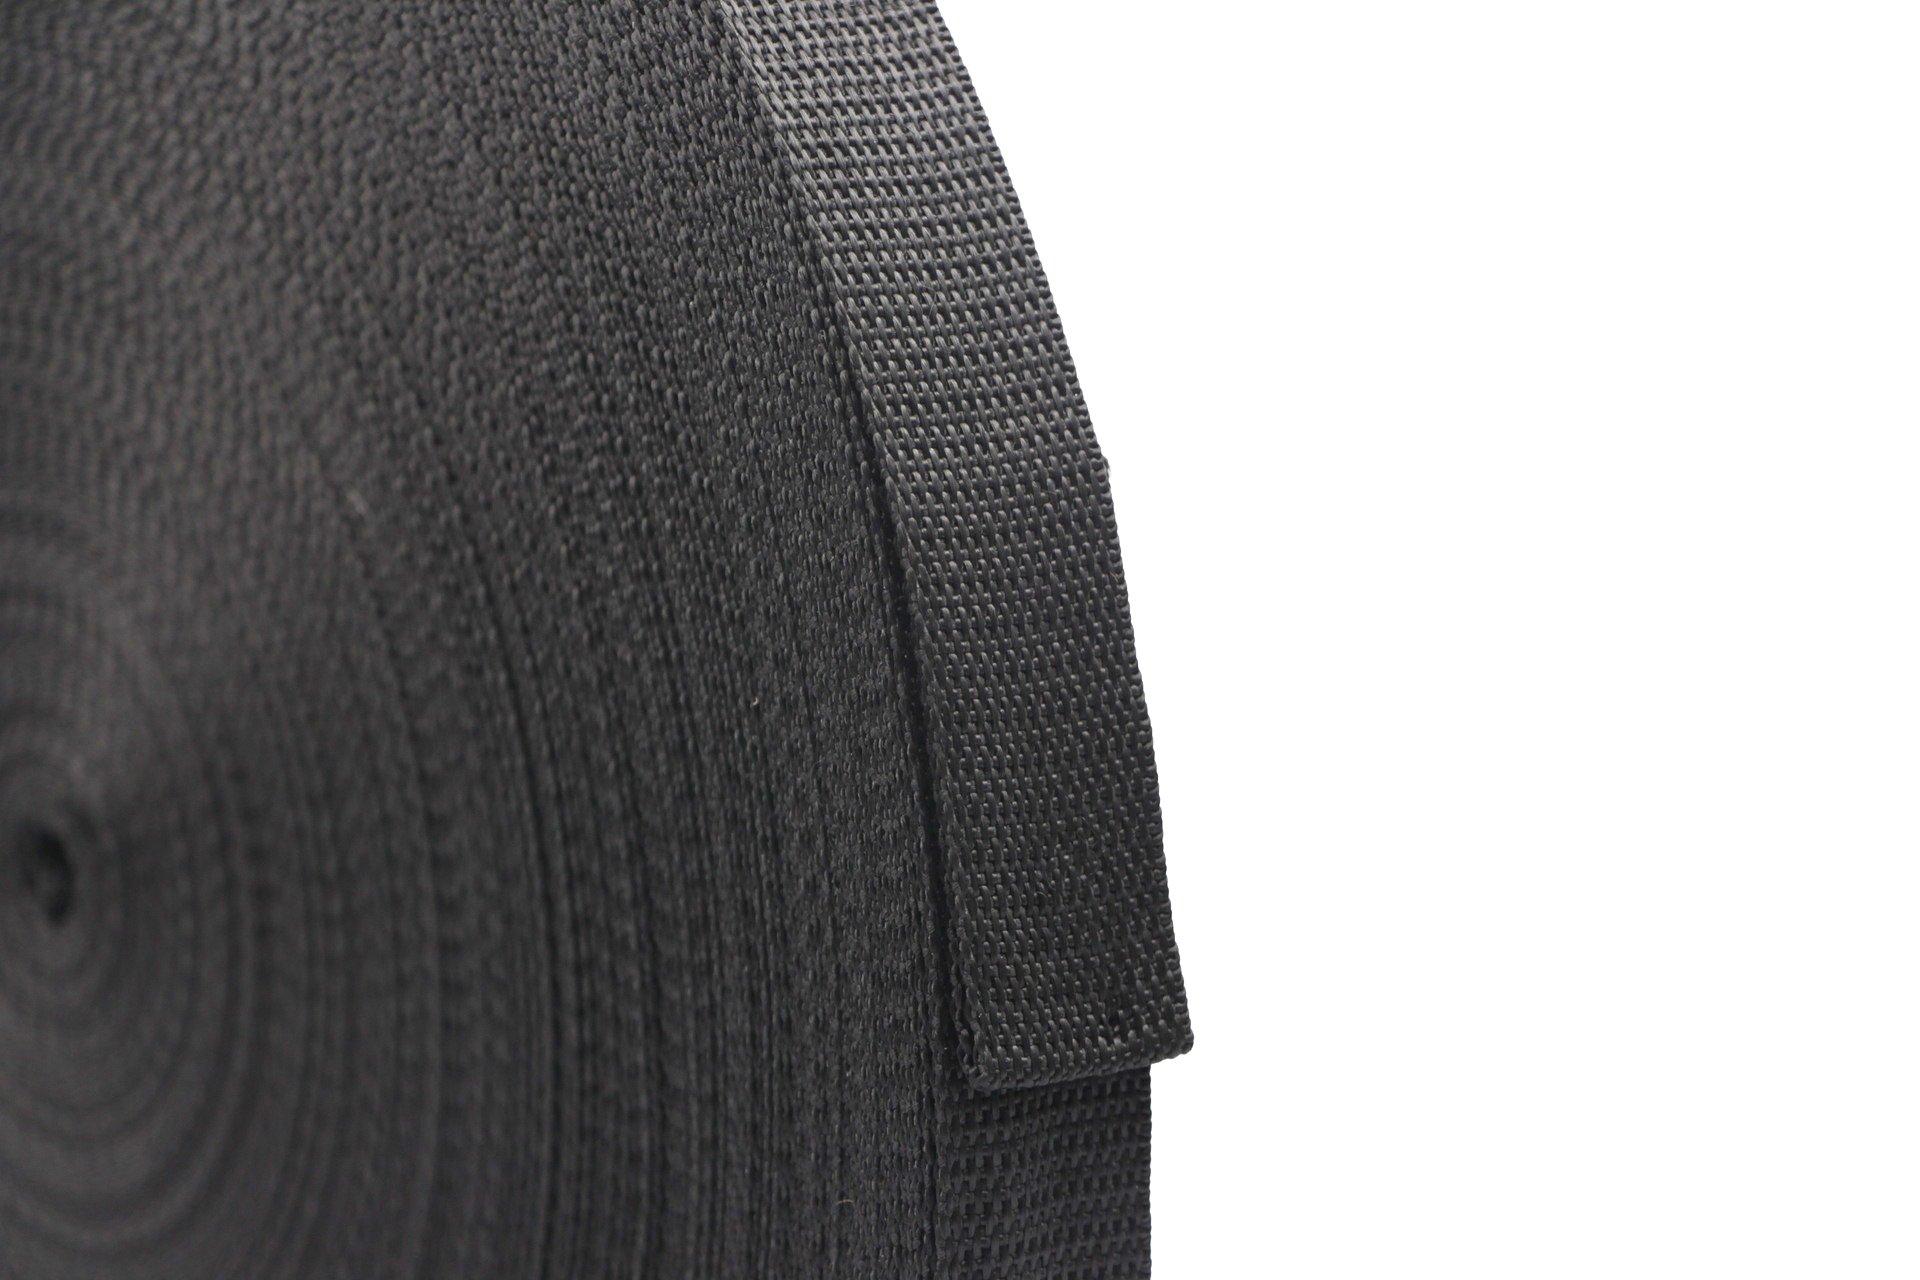 71KxyJqBAJL - RETON 50 Yards Black Nylon Heavy Polypro Webbing Strap (25mm)